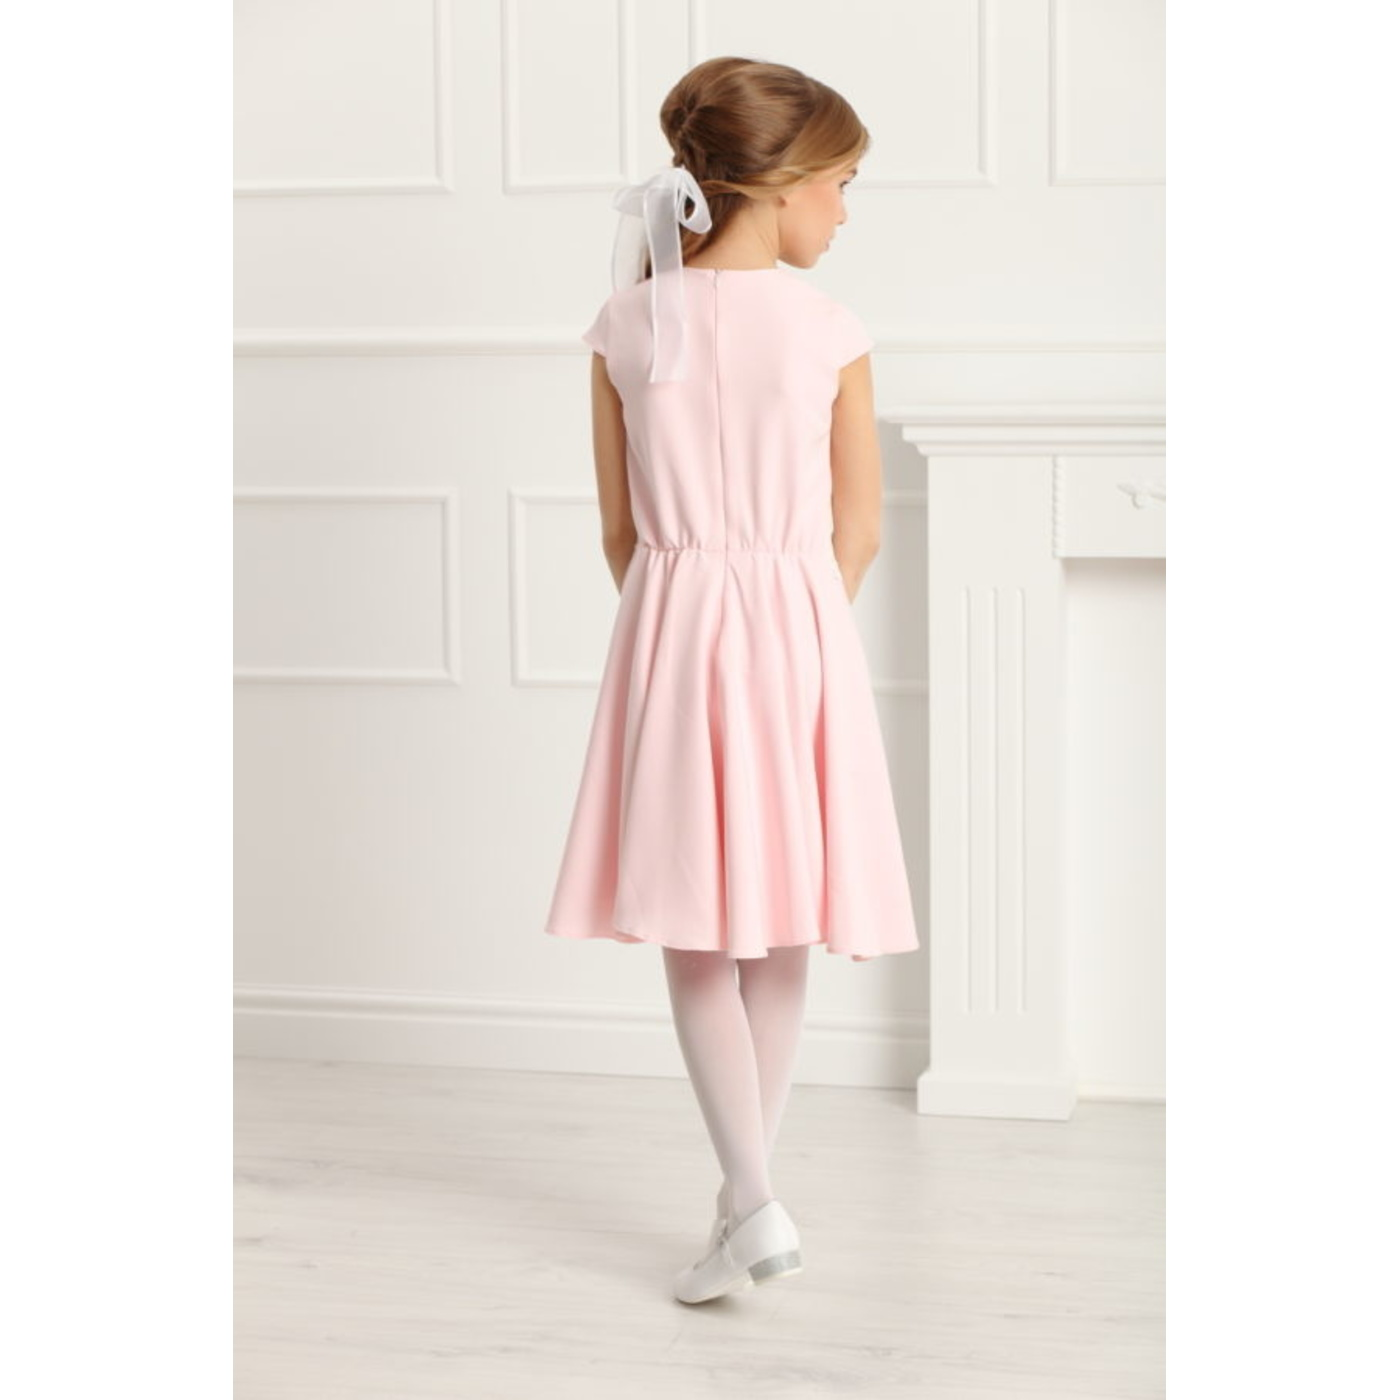 e5b7e7a6b2 ... Sukienka pokomunijna z koronką Barbi Róż